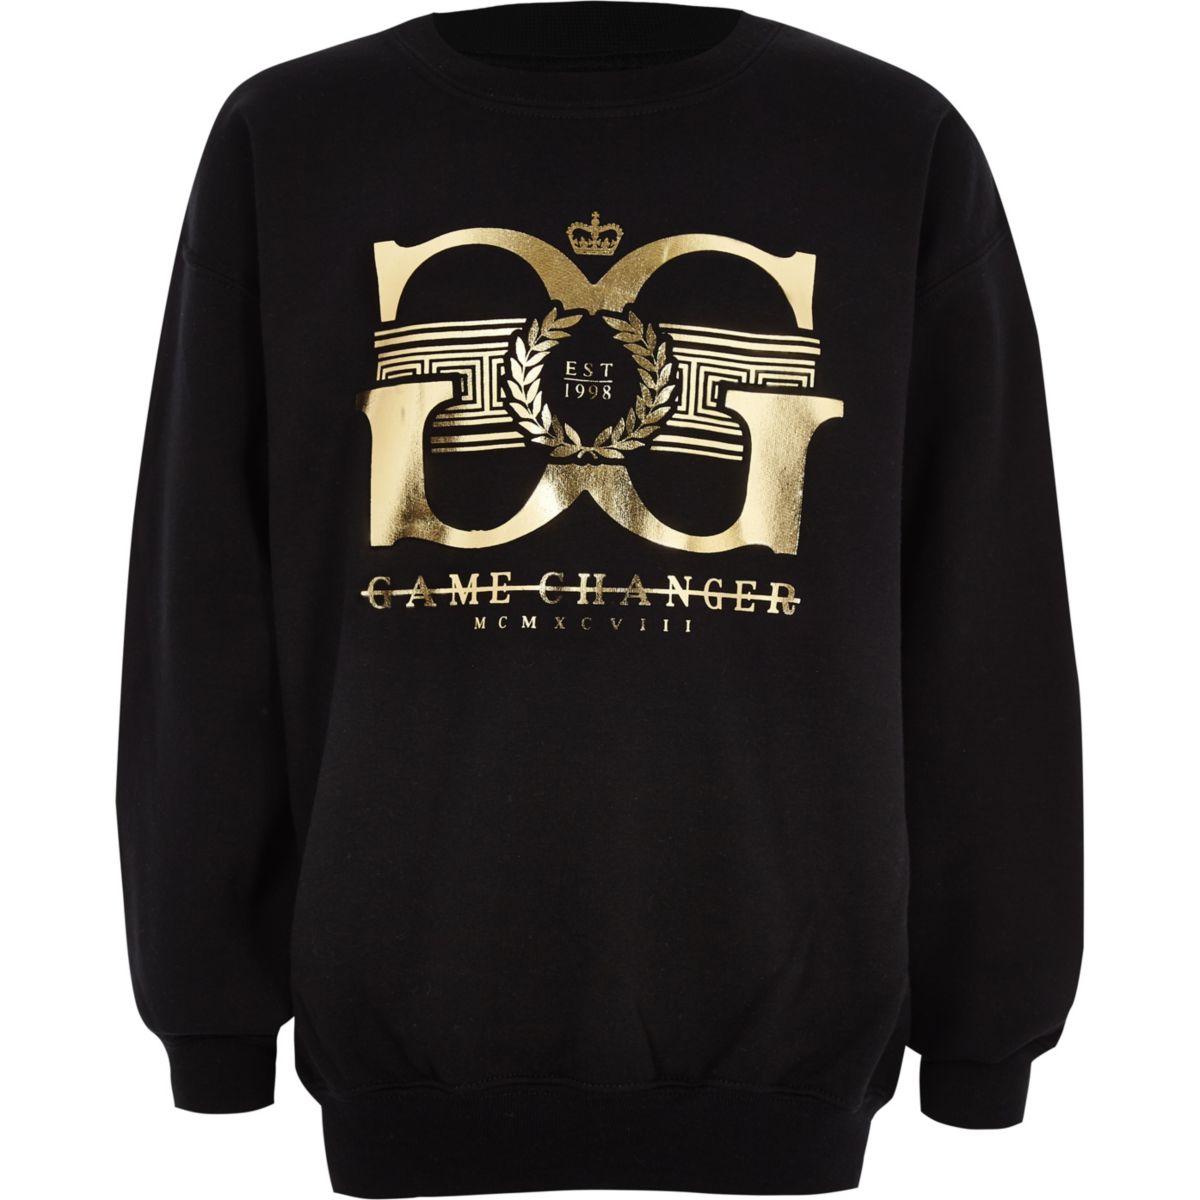 Boys black 'game changer' gold foil sweater